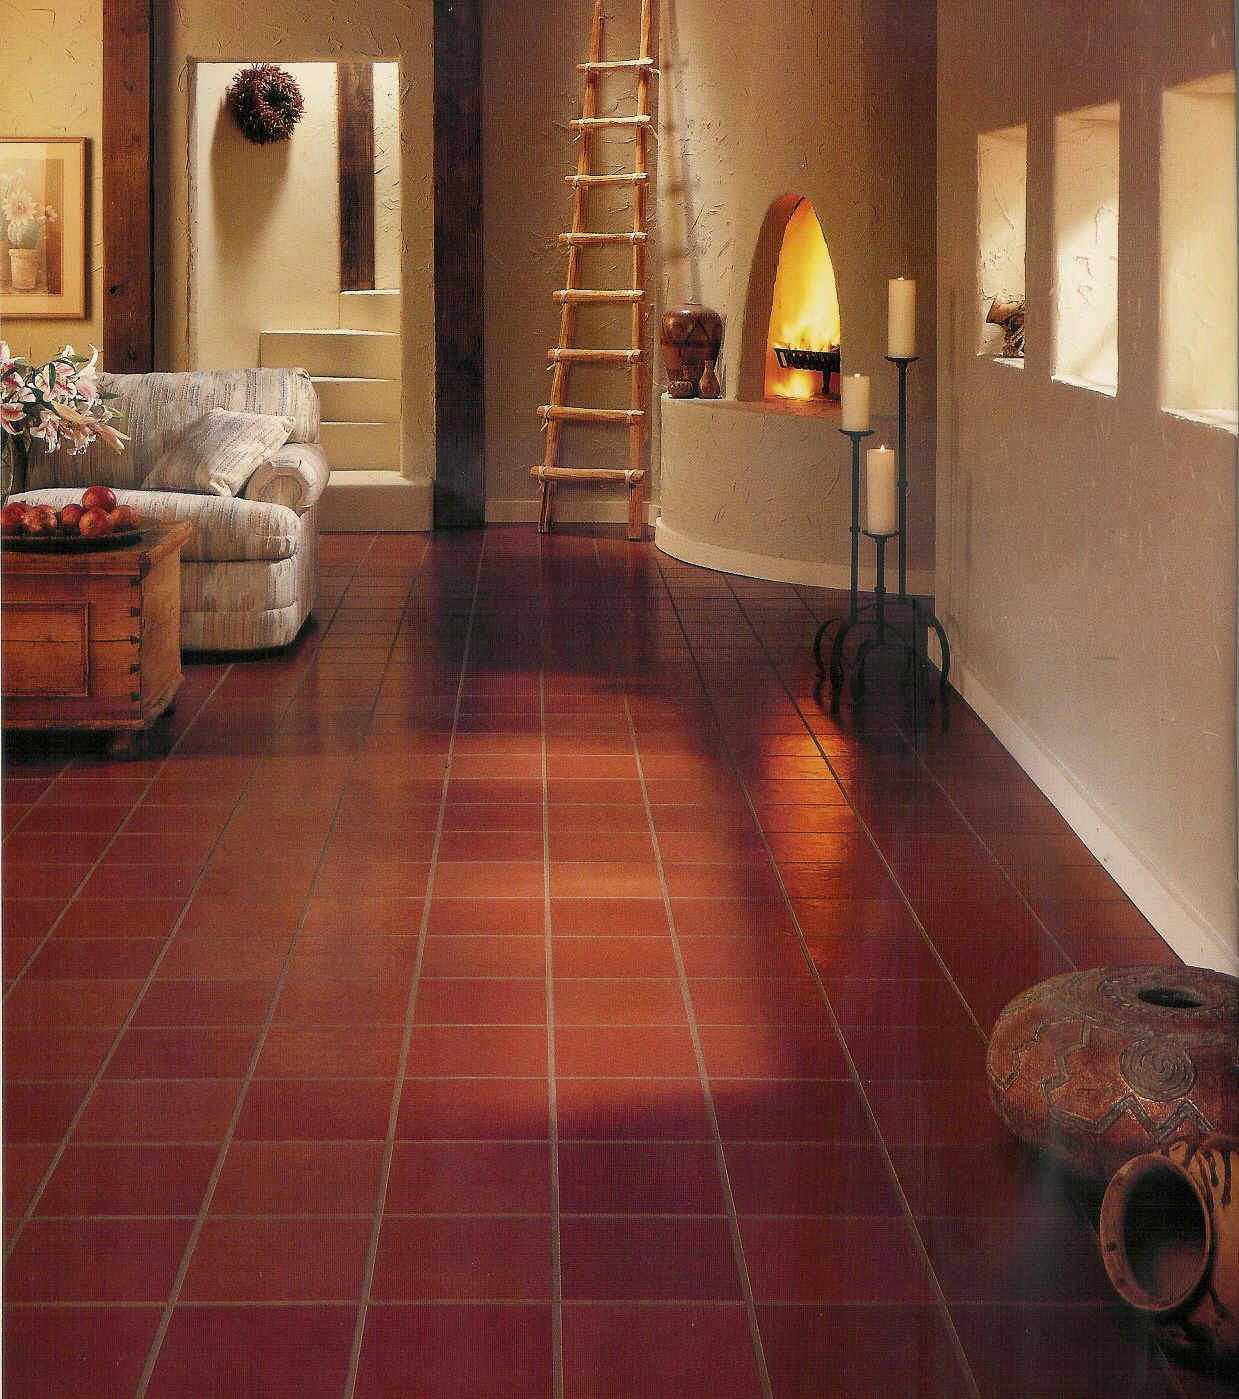 Home Depot Financing Kitchen Remodel Cleaning Cabinets Vinyl Flooring Or Tiles Tile Design Ideas